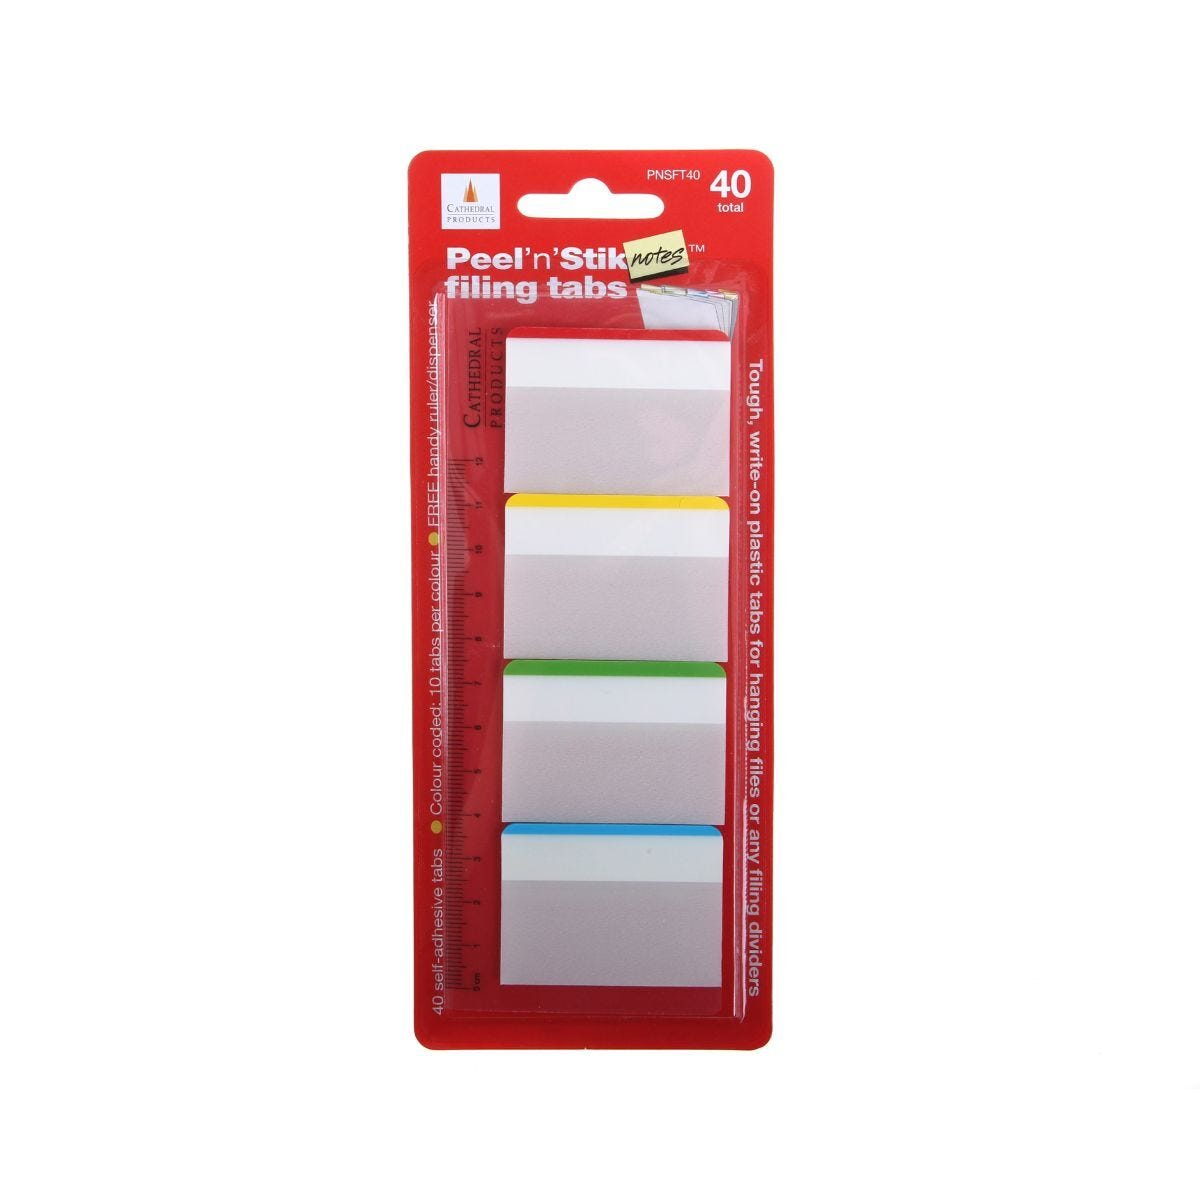 Filing Tabs Self Adhesive Pack of 40